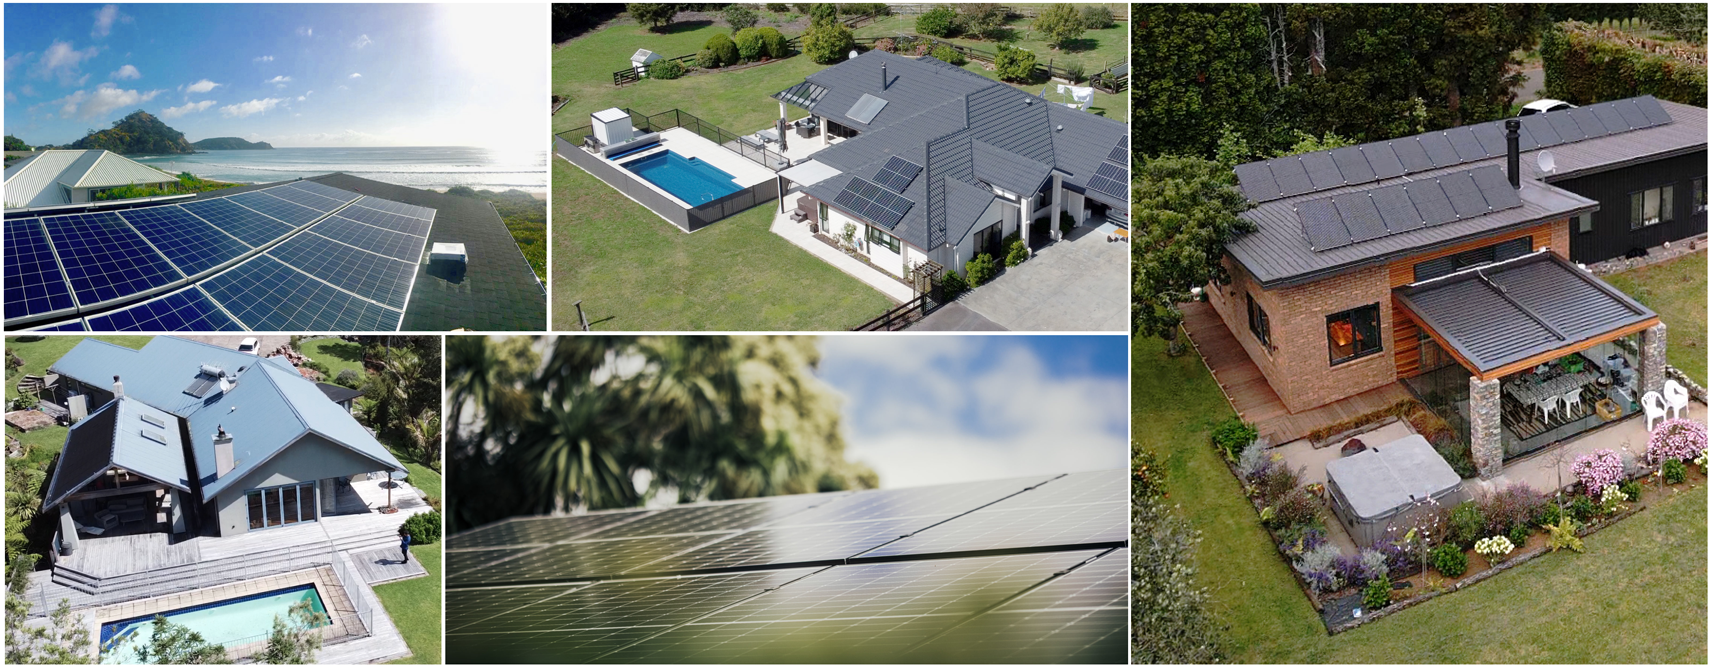 solar panel installation new zealand